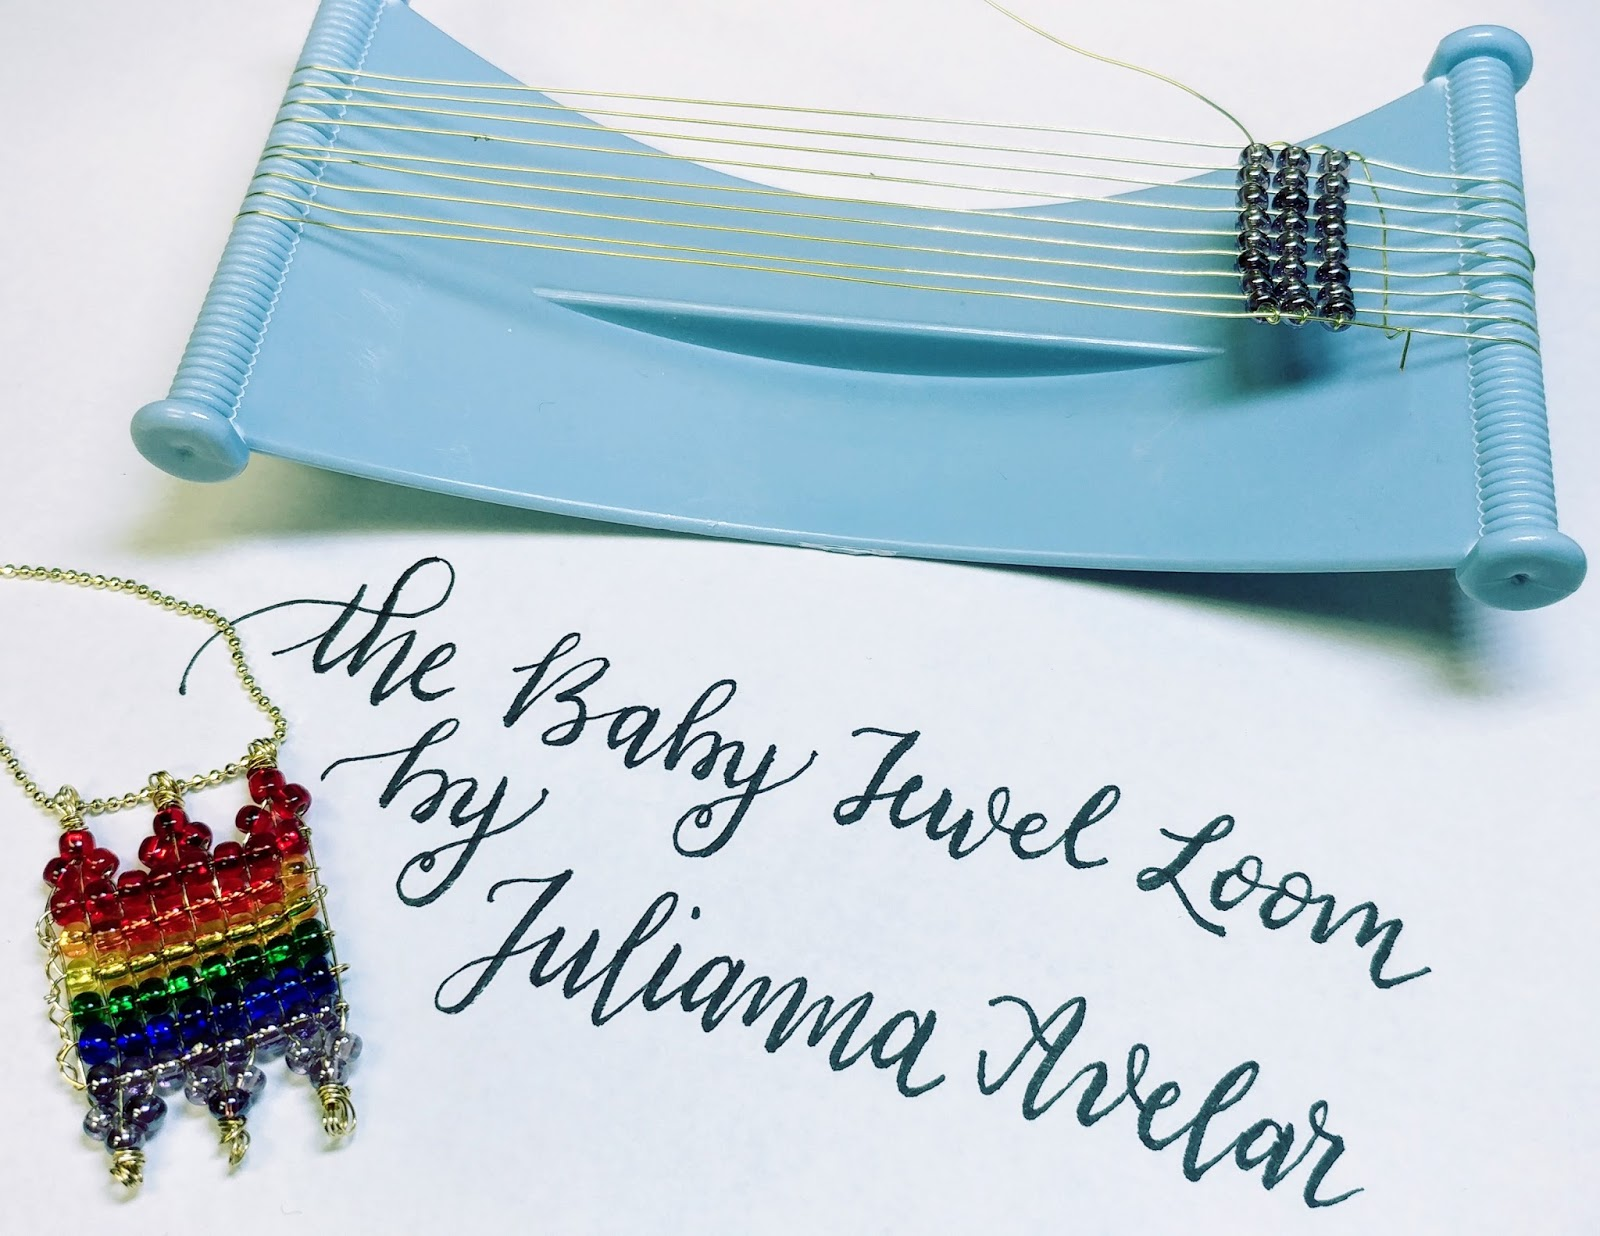 The Baby Jewel Loom By Julianna Avelar